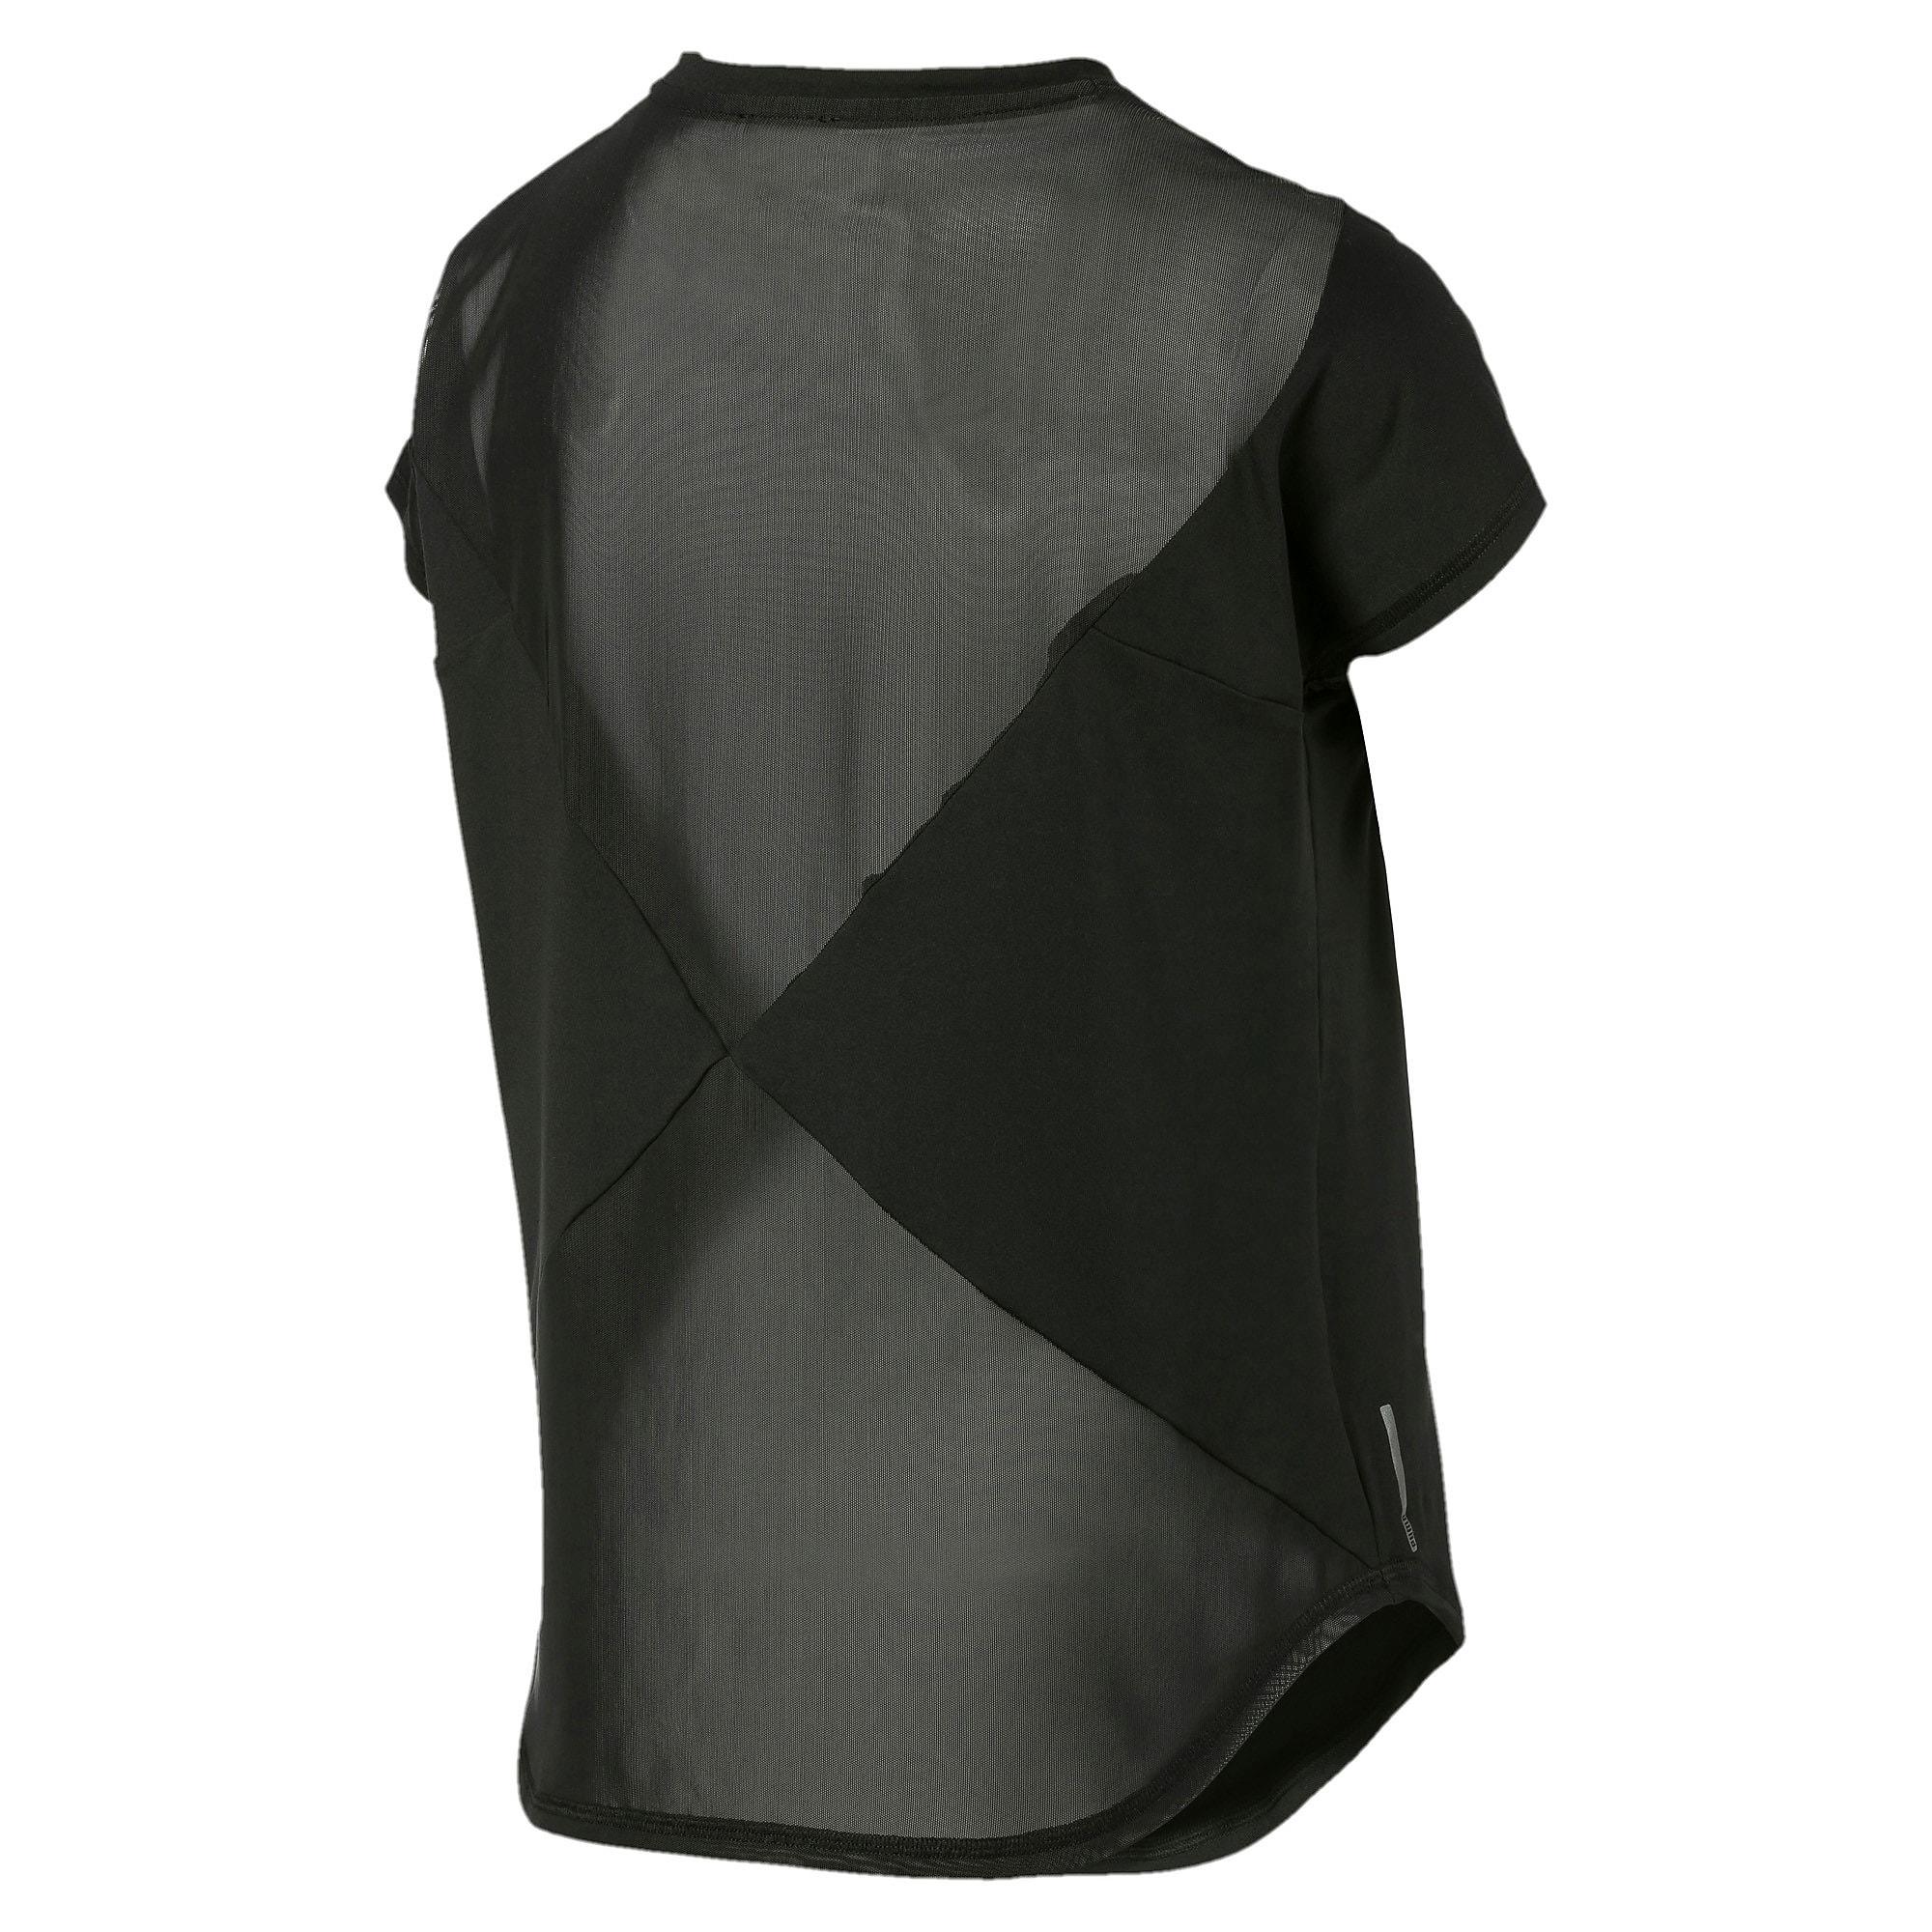 Thumbnail 6 of スタジオ SS メッシュ ウィメンズ トレーニング Tシャツ 半袖, Puma Black, medium-JPN